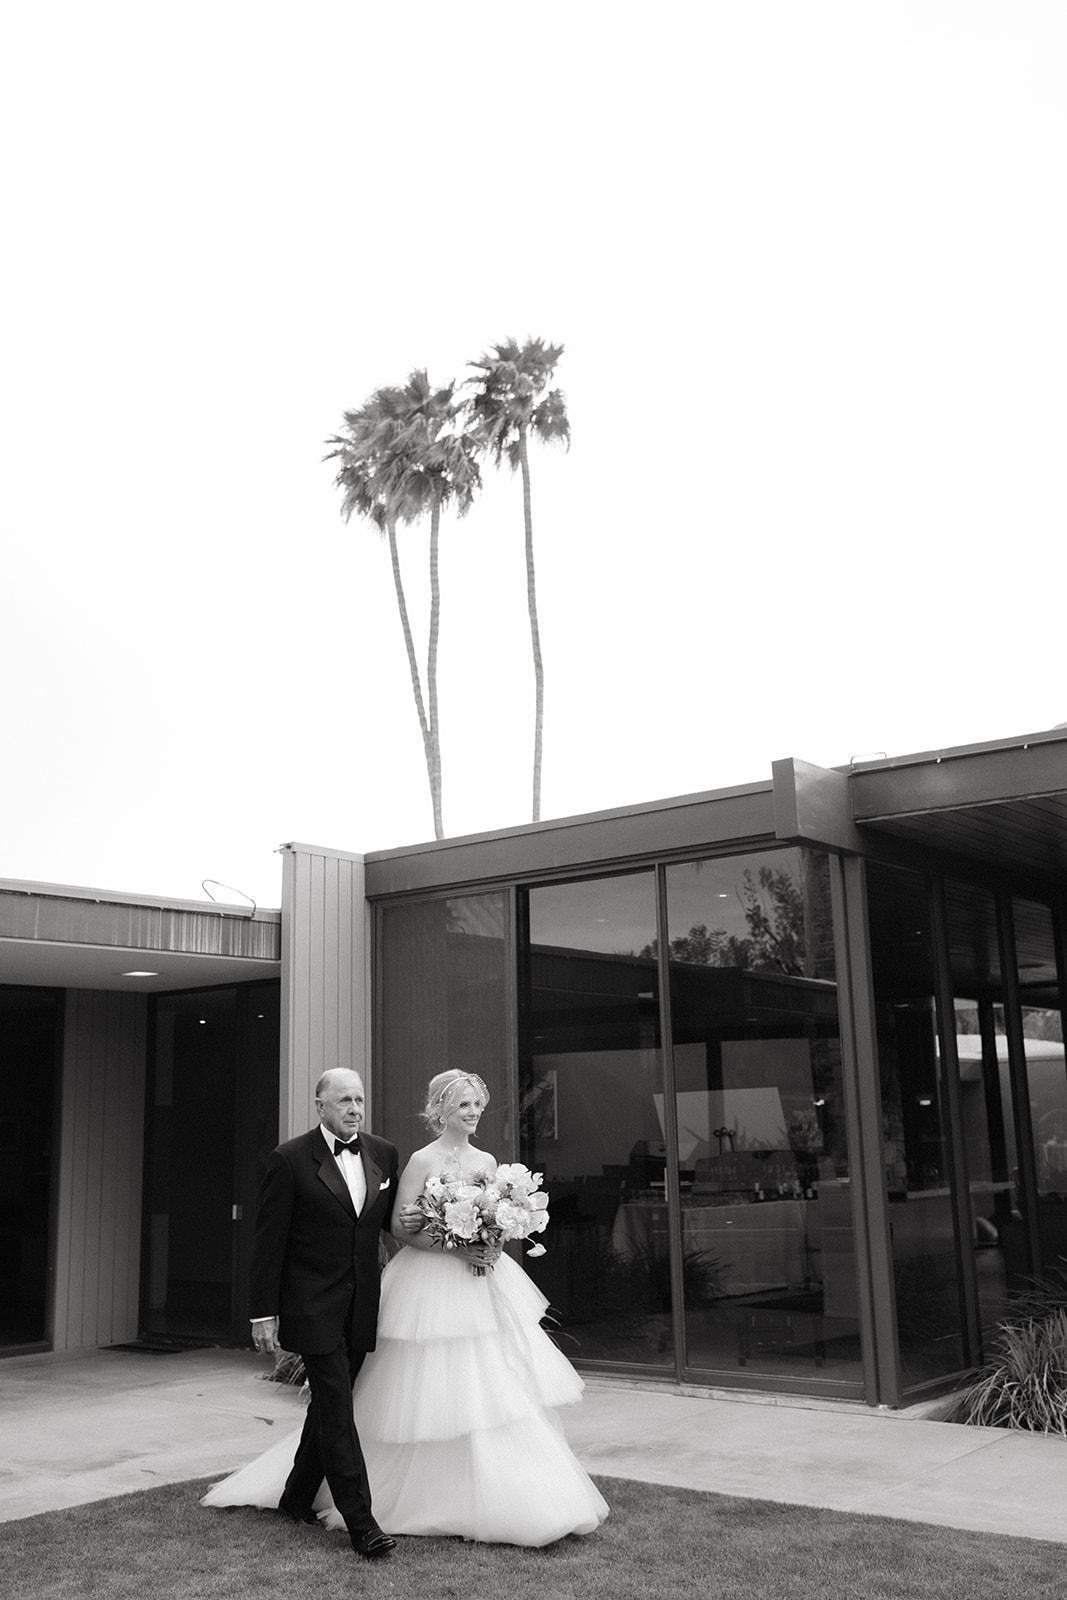 KL_WEDDING_0417.jpg